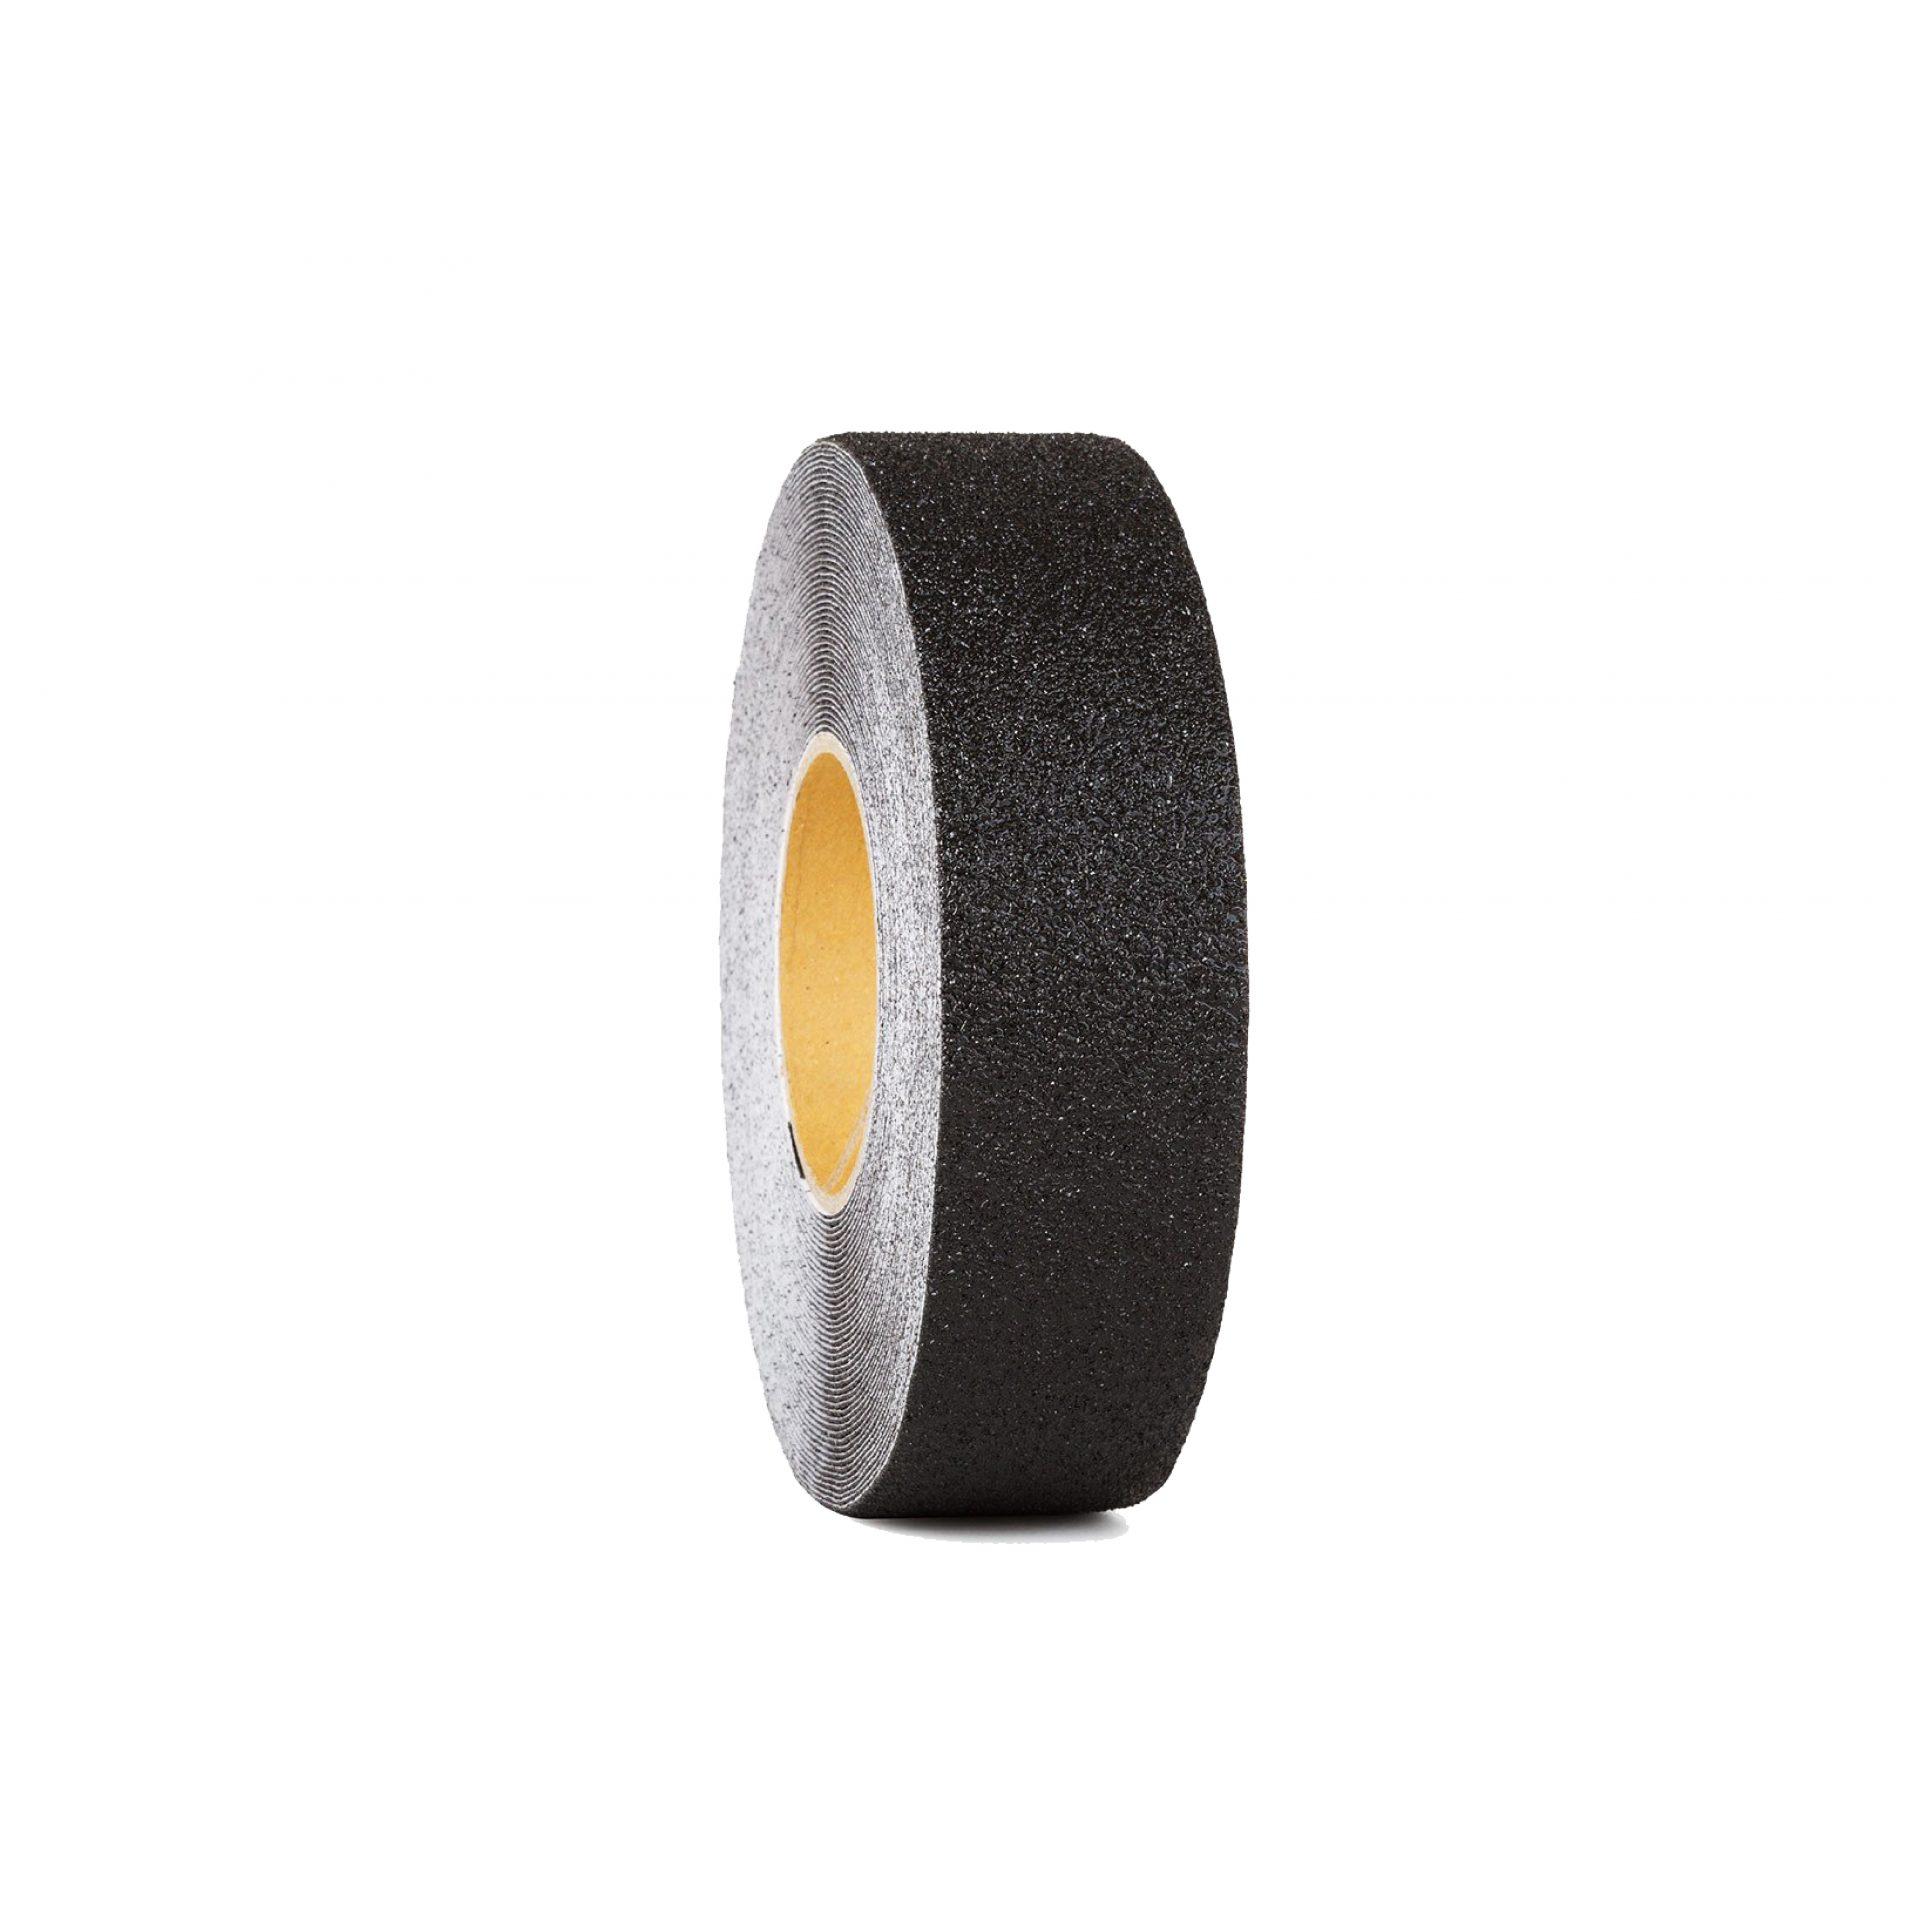 Non-Adhesive Tape